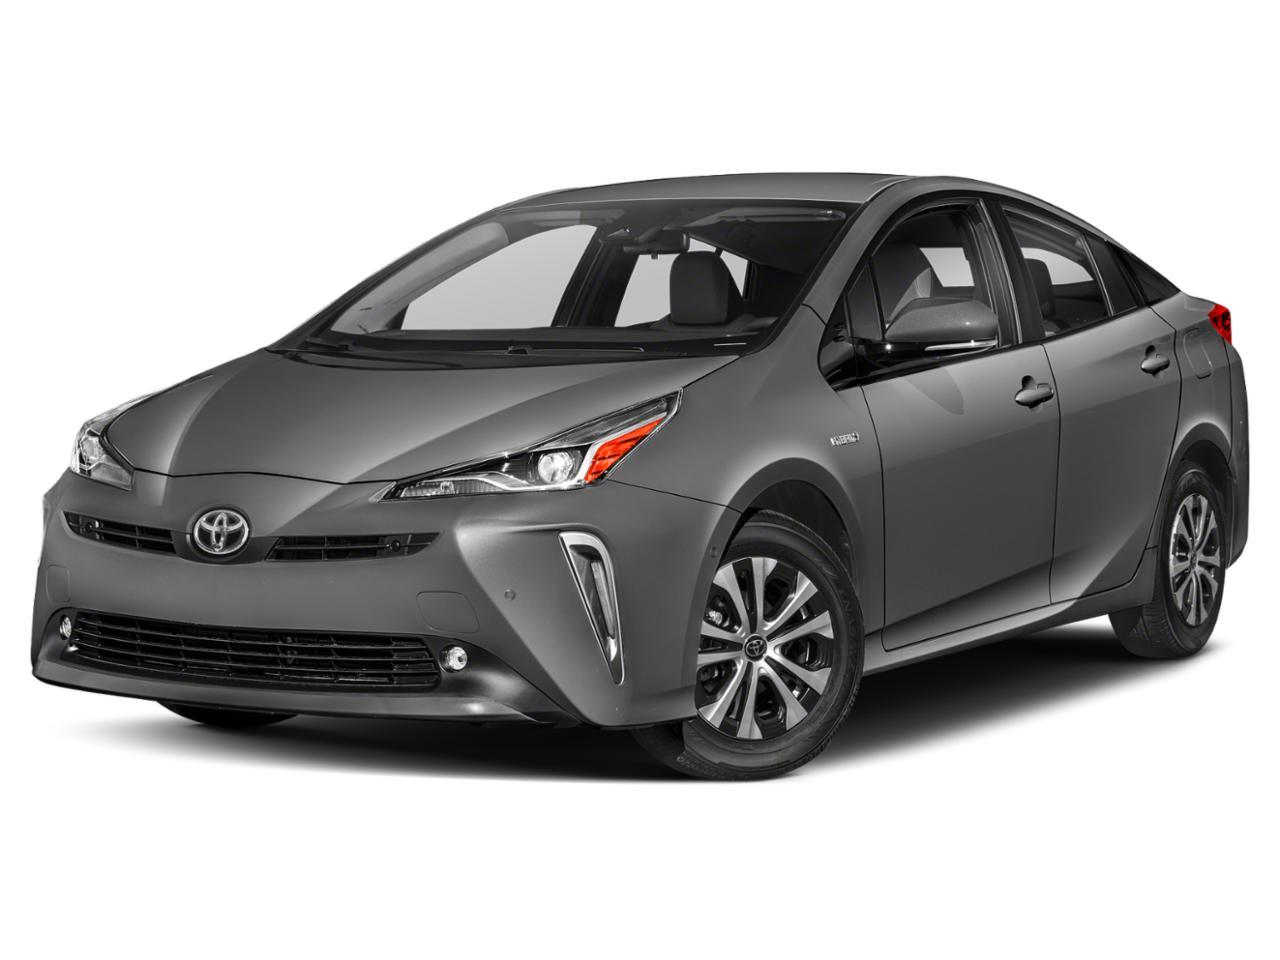 2022 Toyota Prius Vehicle Photo in Oshkosh, WI 54904